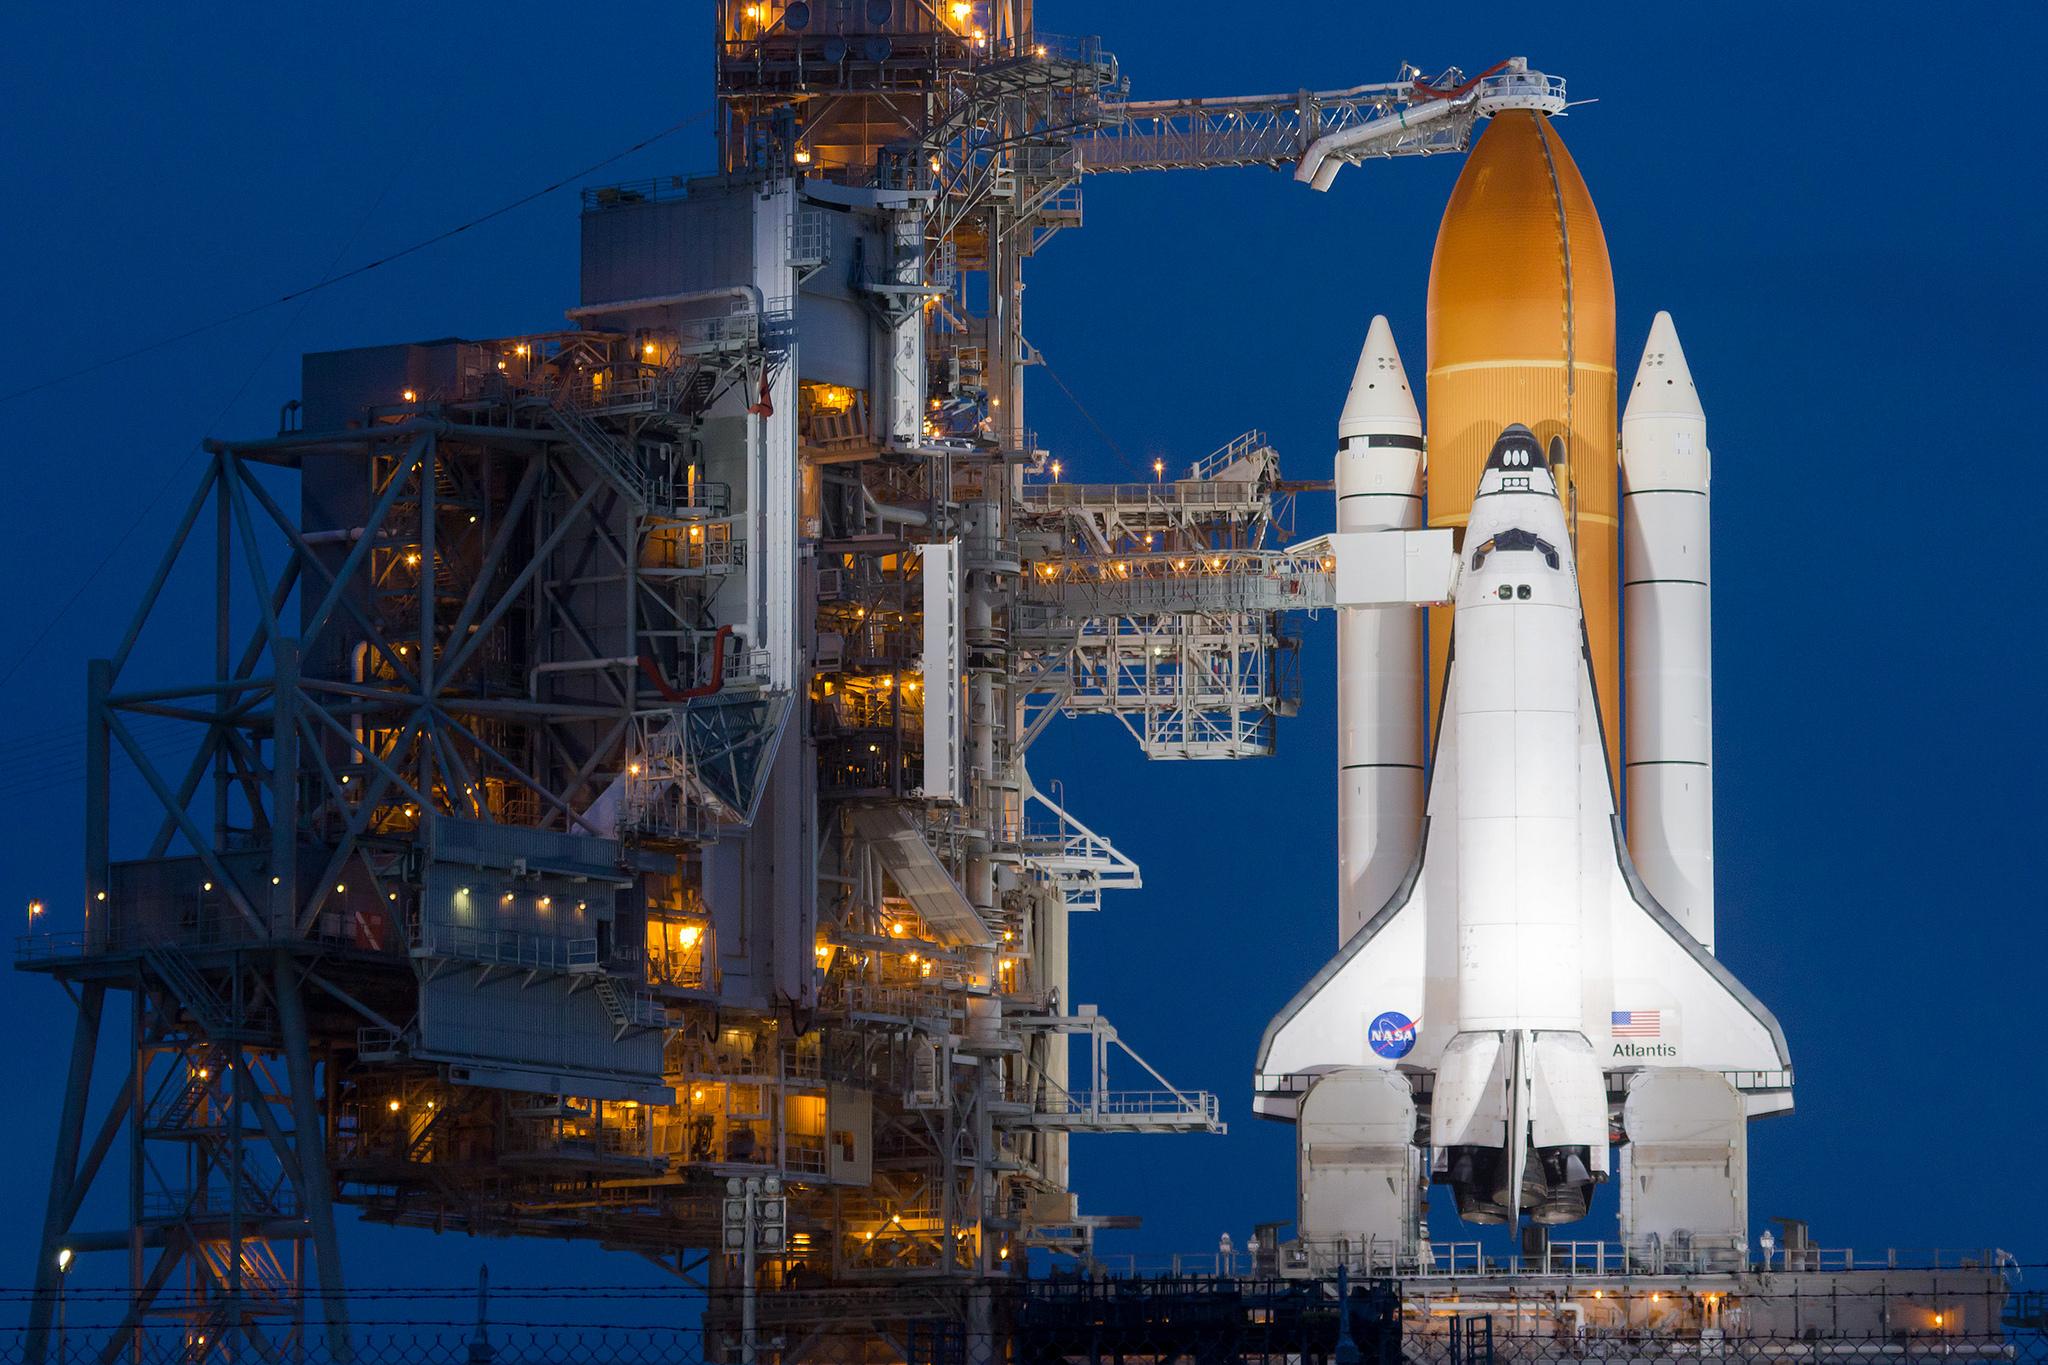 space shuttle atlantis - HD1920×1280